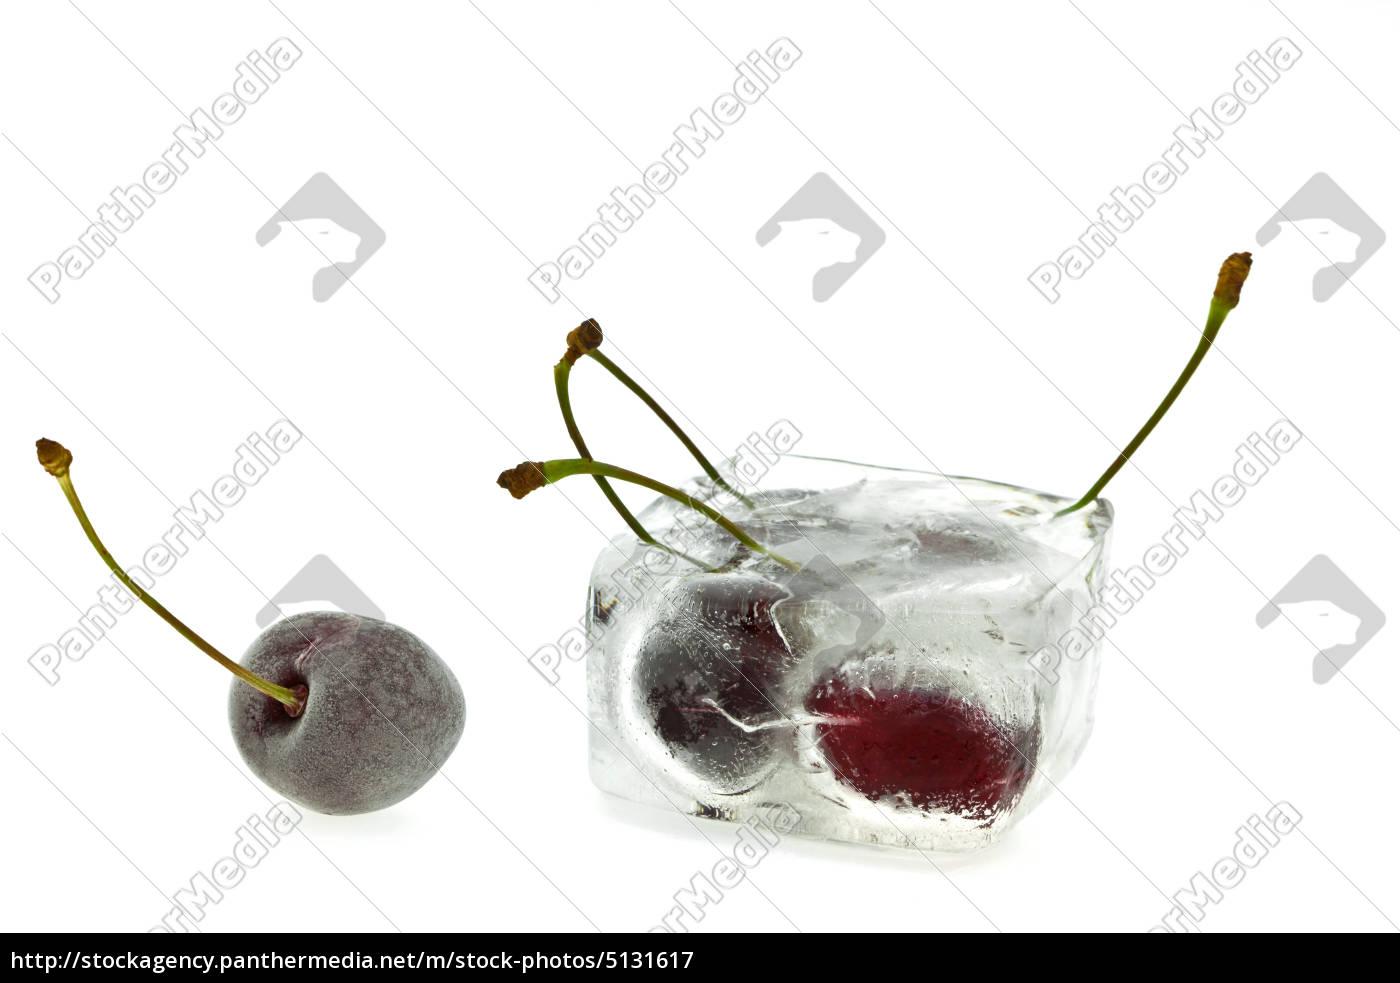 gefrohrene, cherries - 5131617